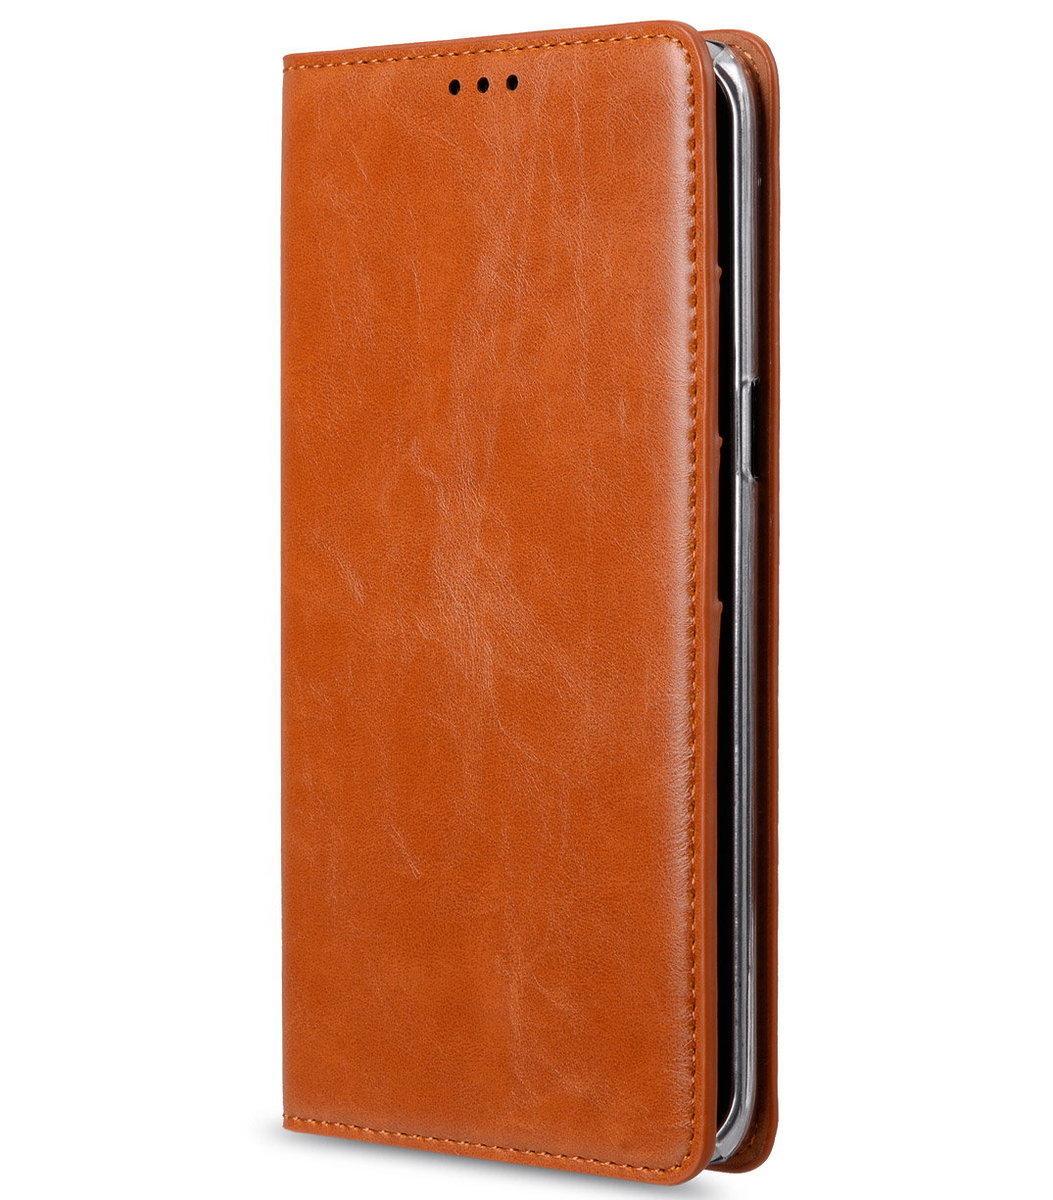 Samsung Galaxy S6 Edge Plus Herman 系列人造皮手機套 - 瘋馬啡色